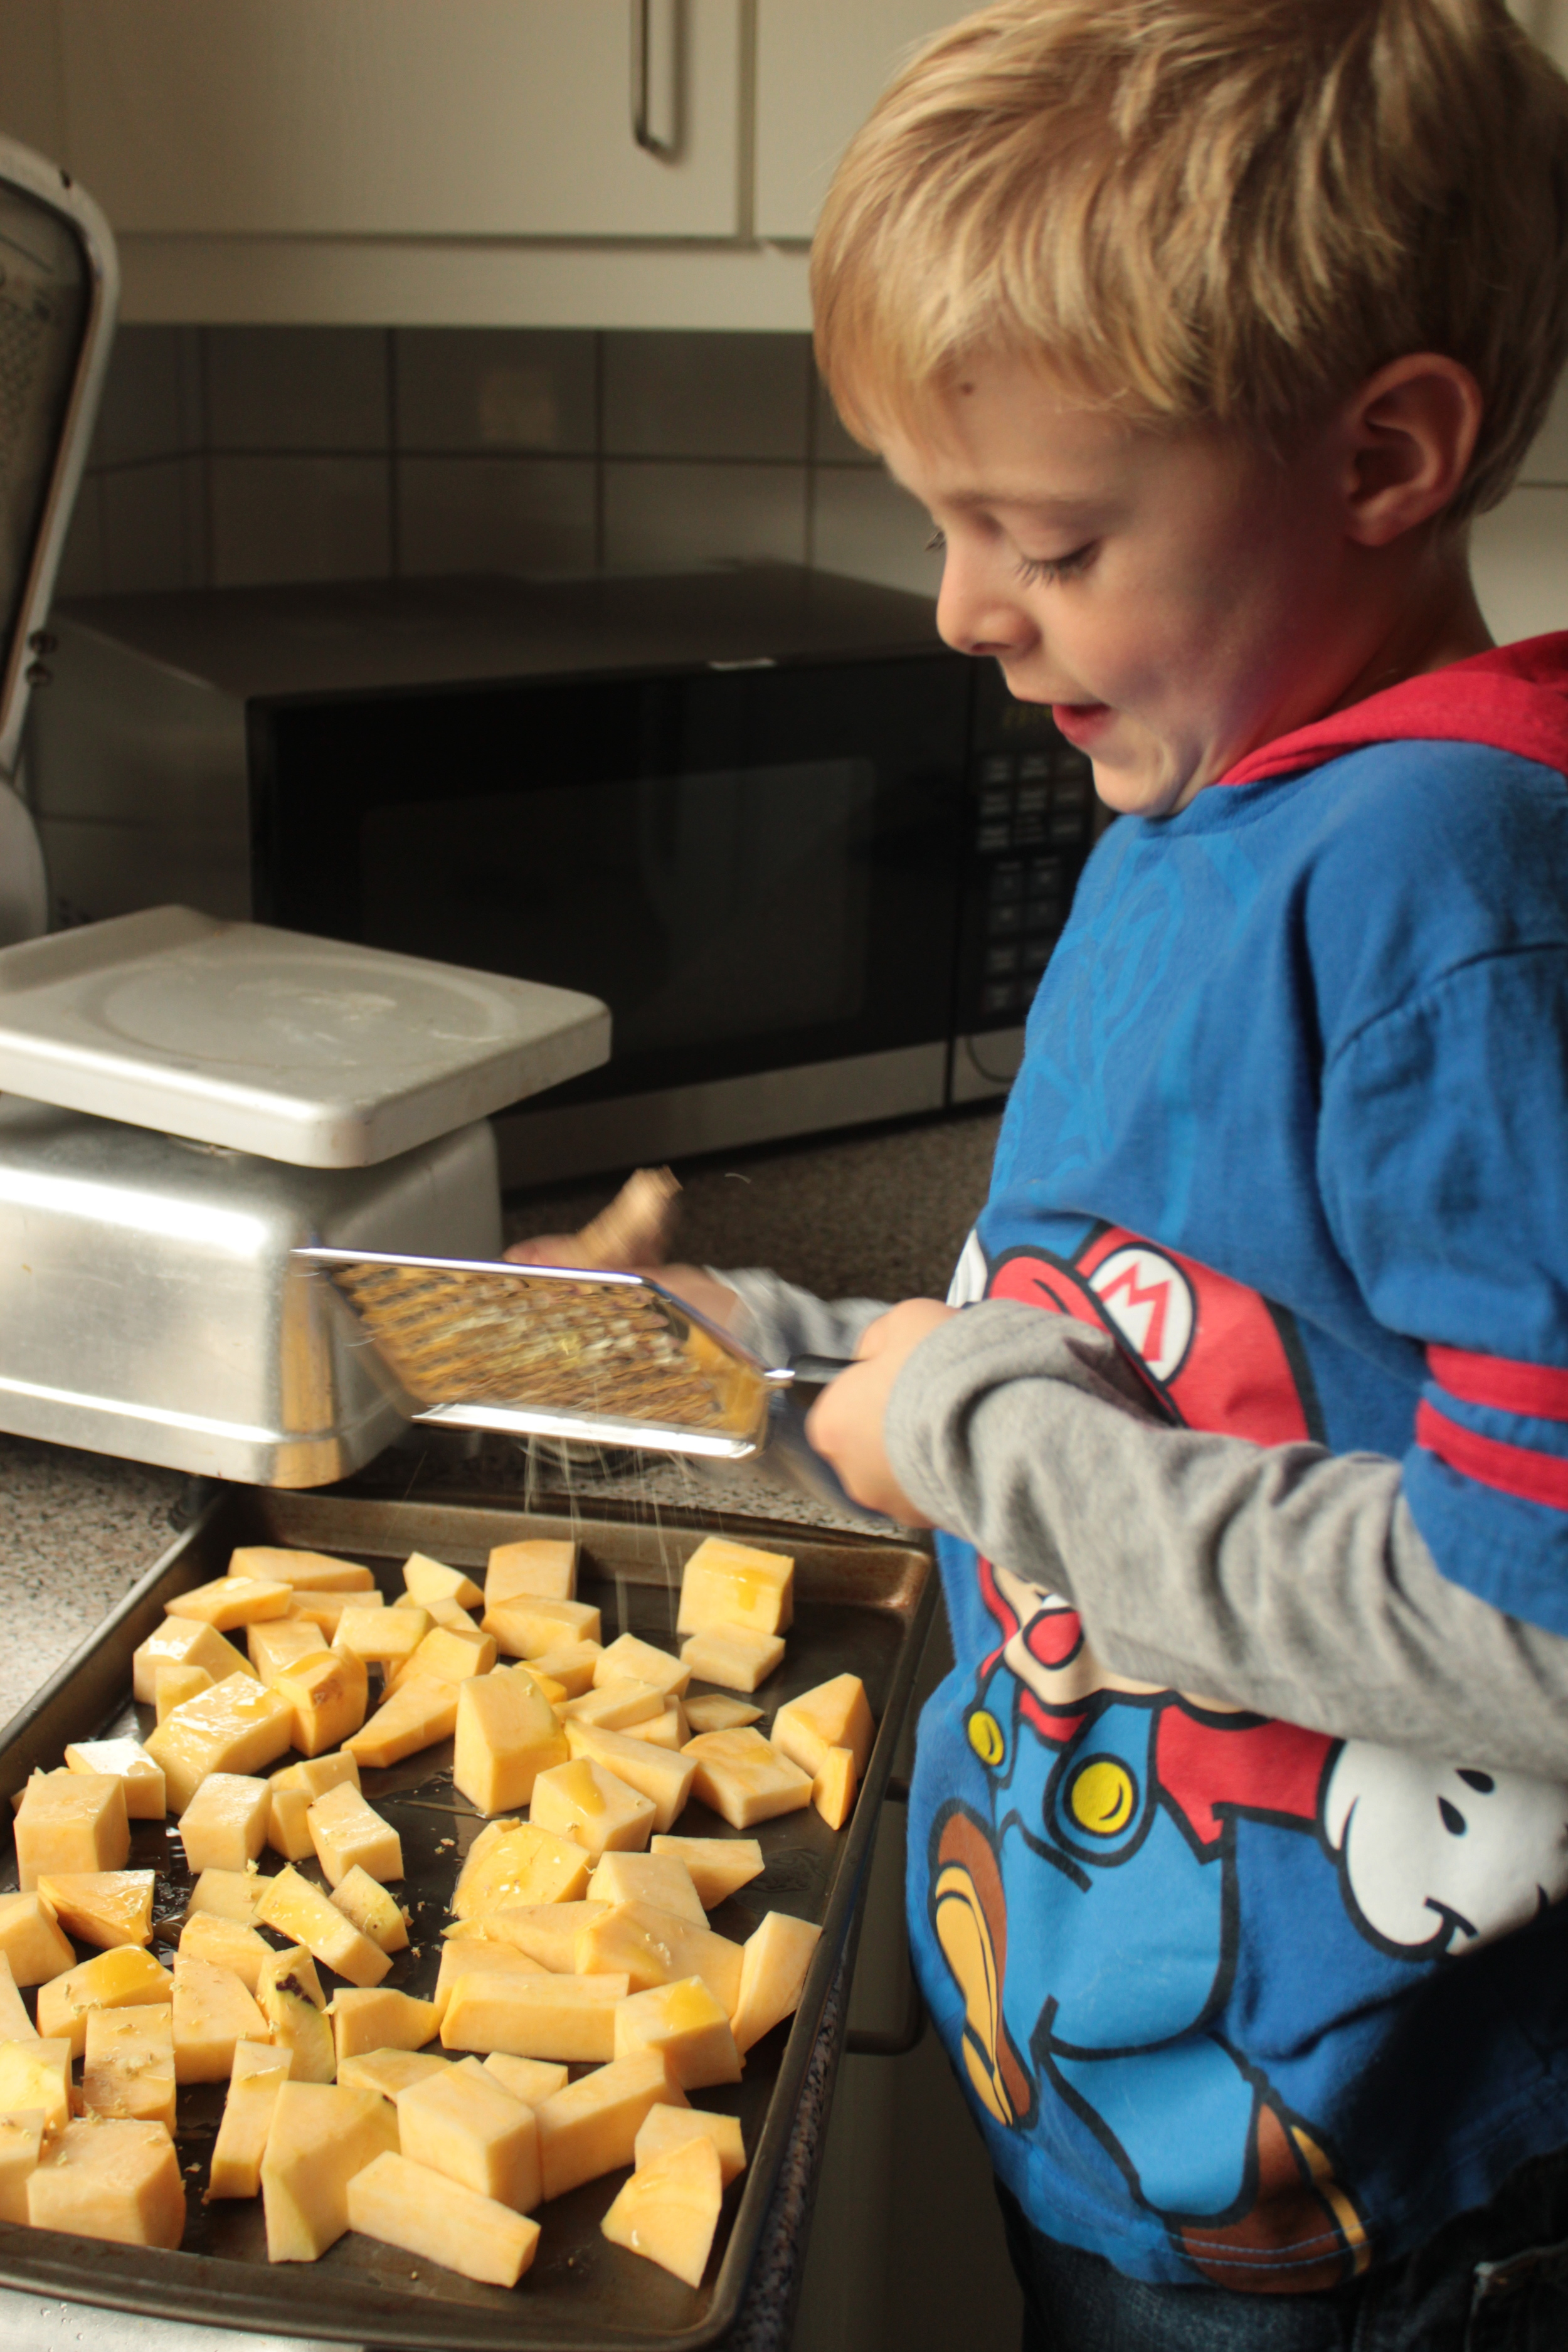 Grating the ginger